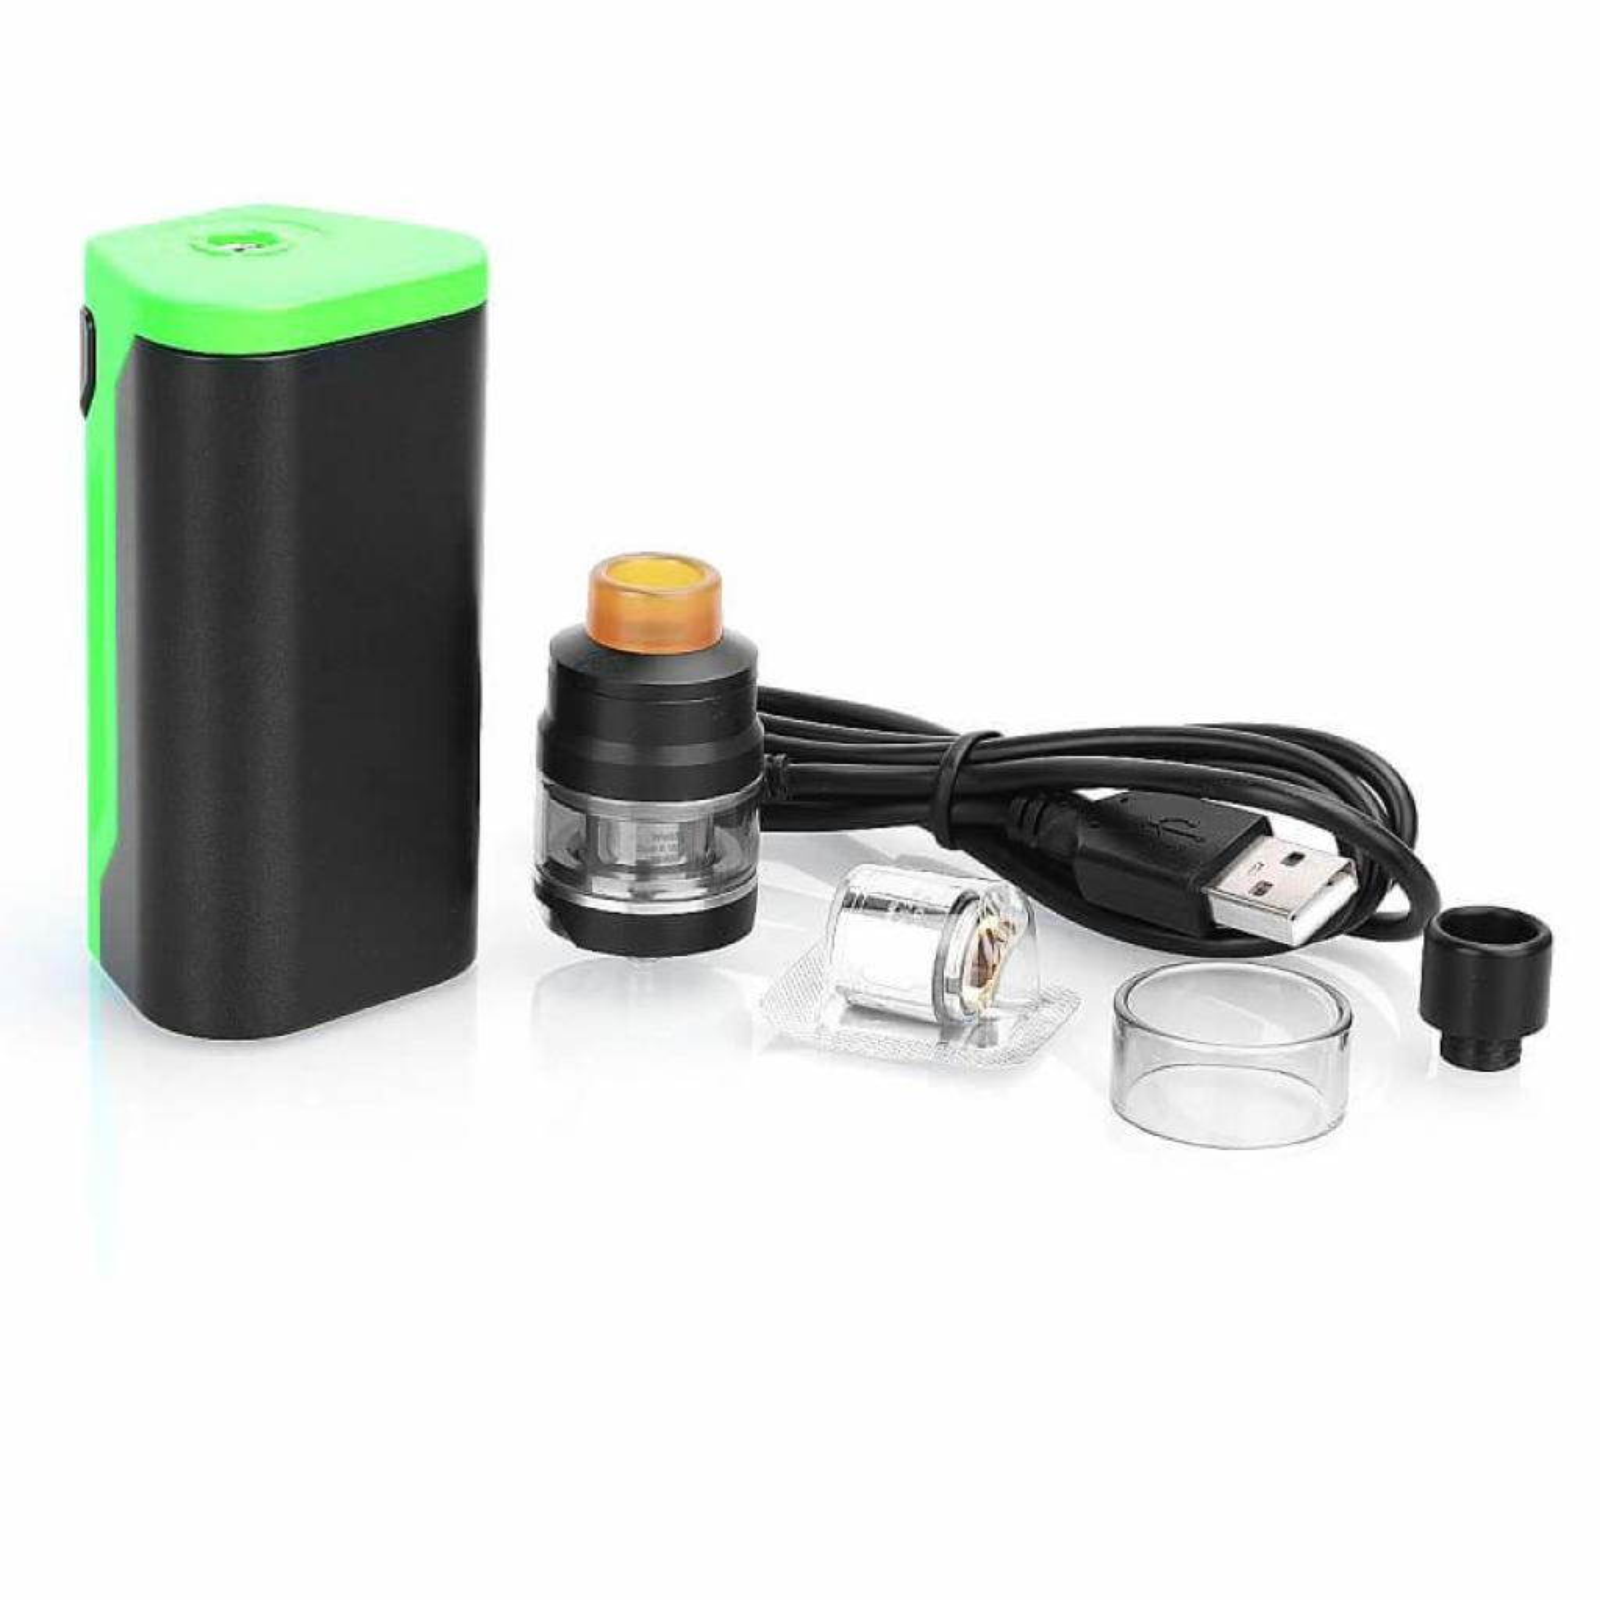 Стартовый набор Wismec Reuleaux RX2 20700 with Gnome Tank Kit Green (WISRX2KGR) изображение 5